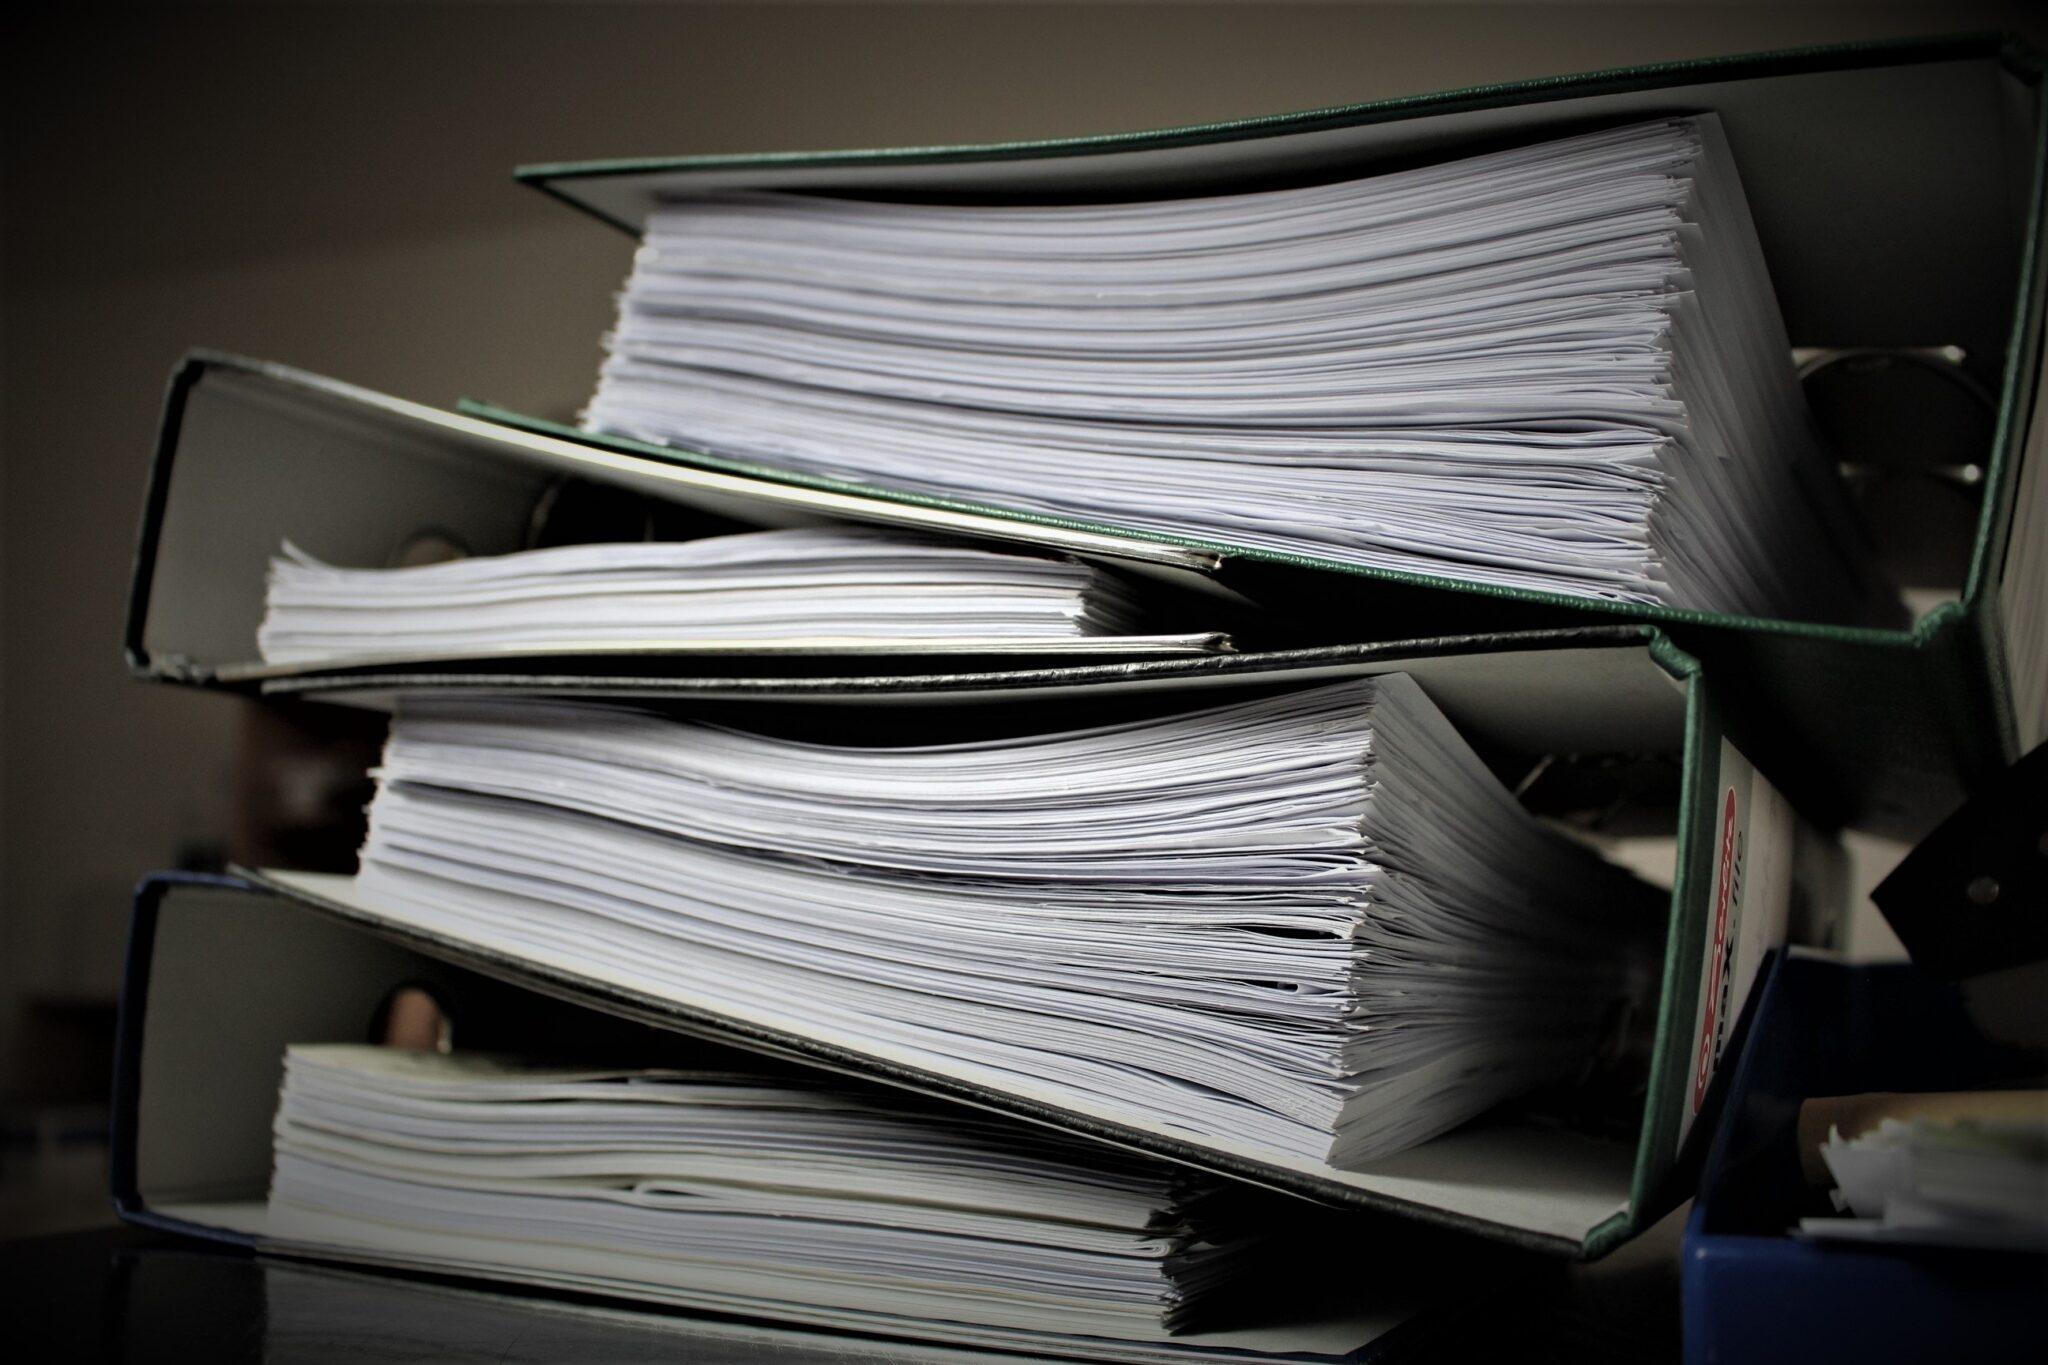 Stack of full binders